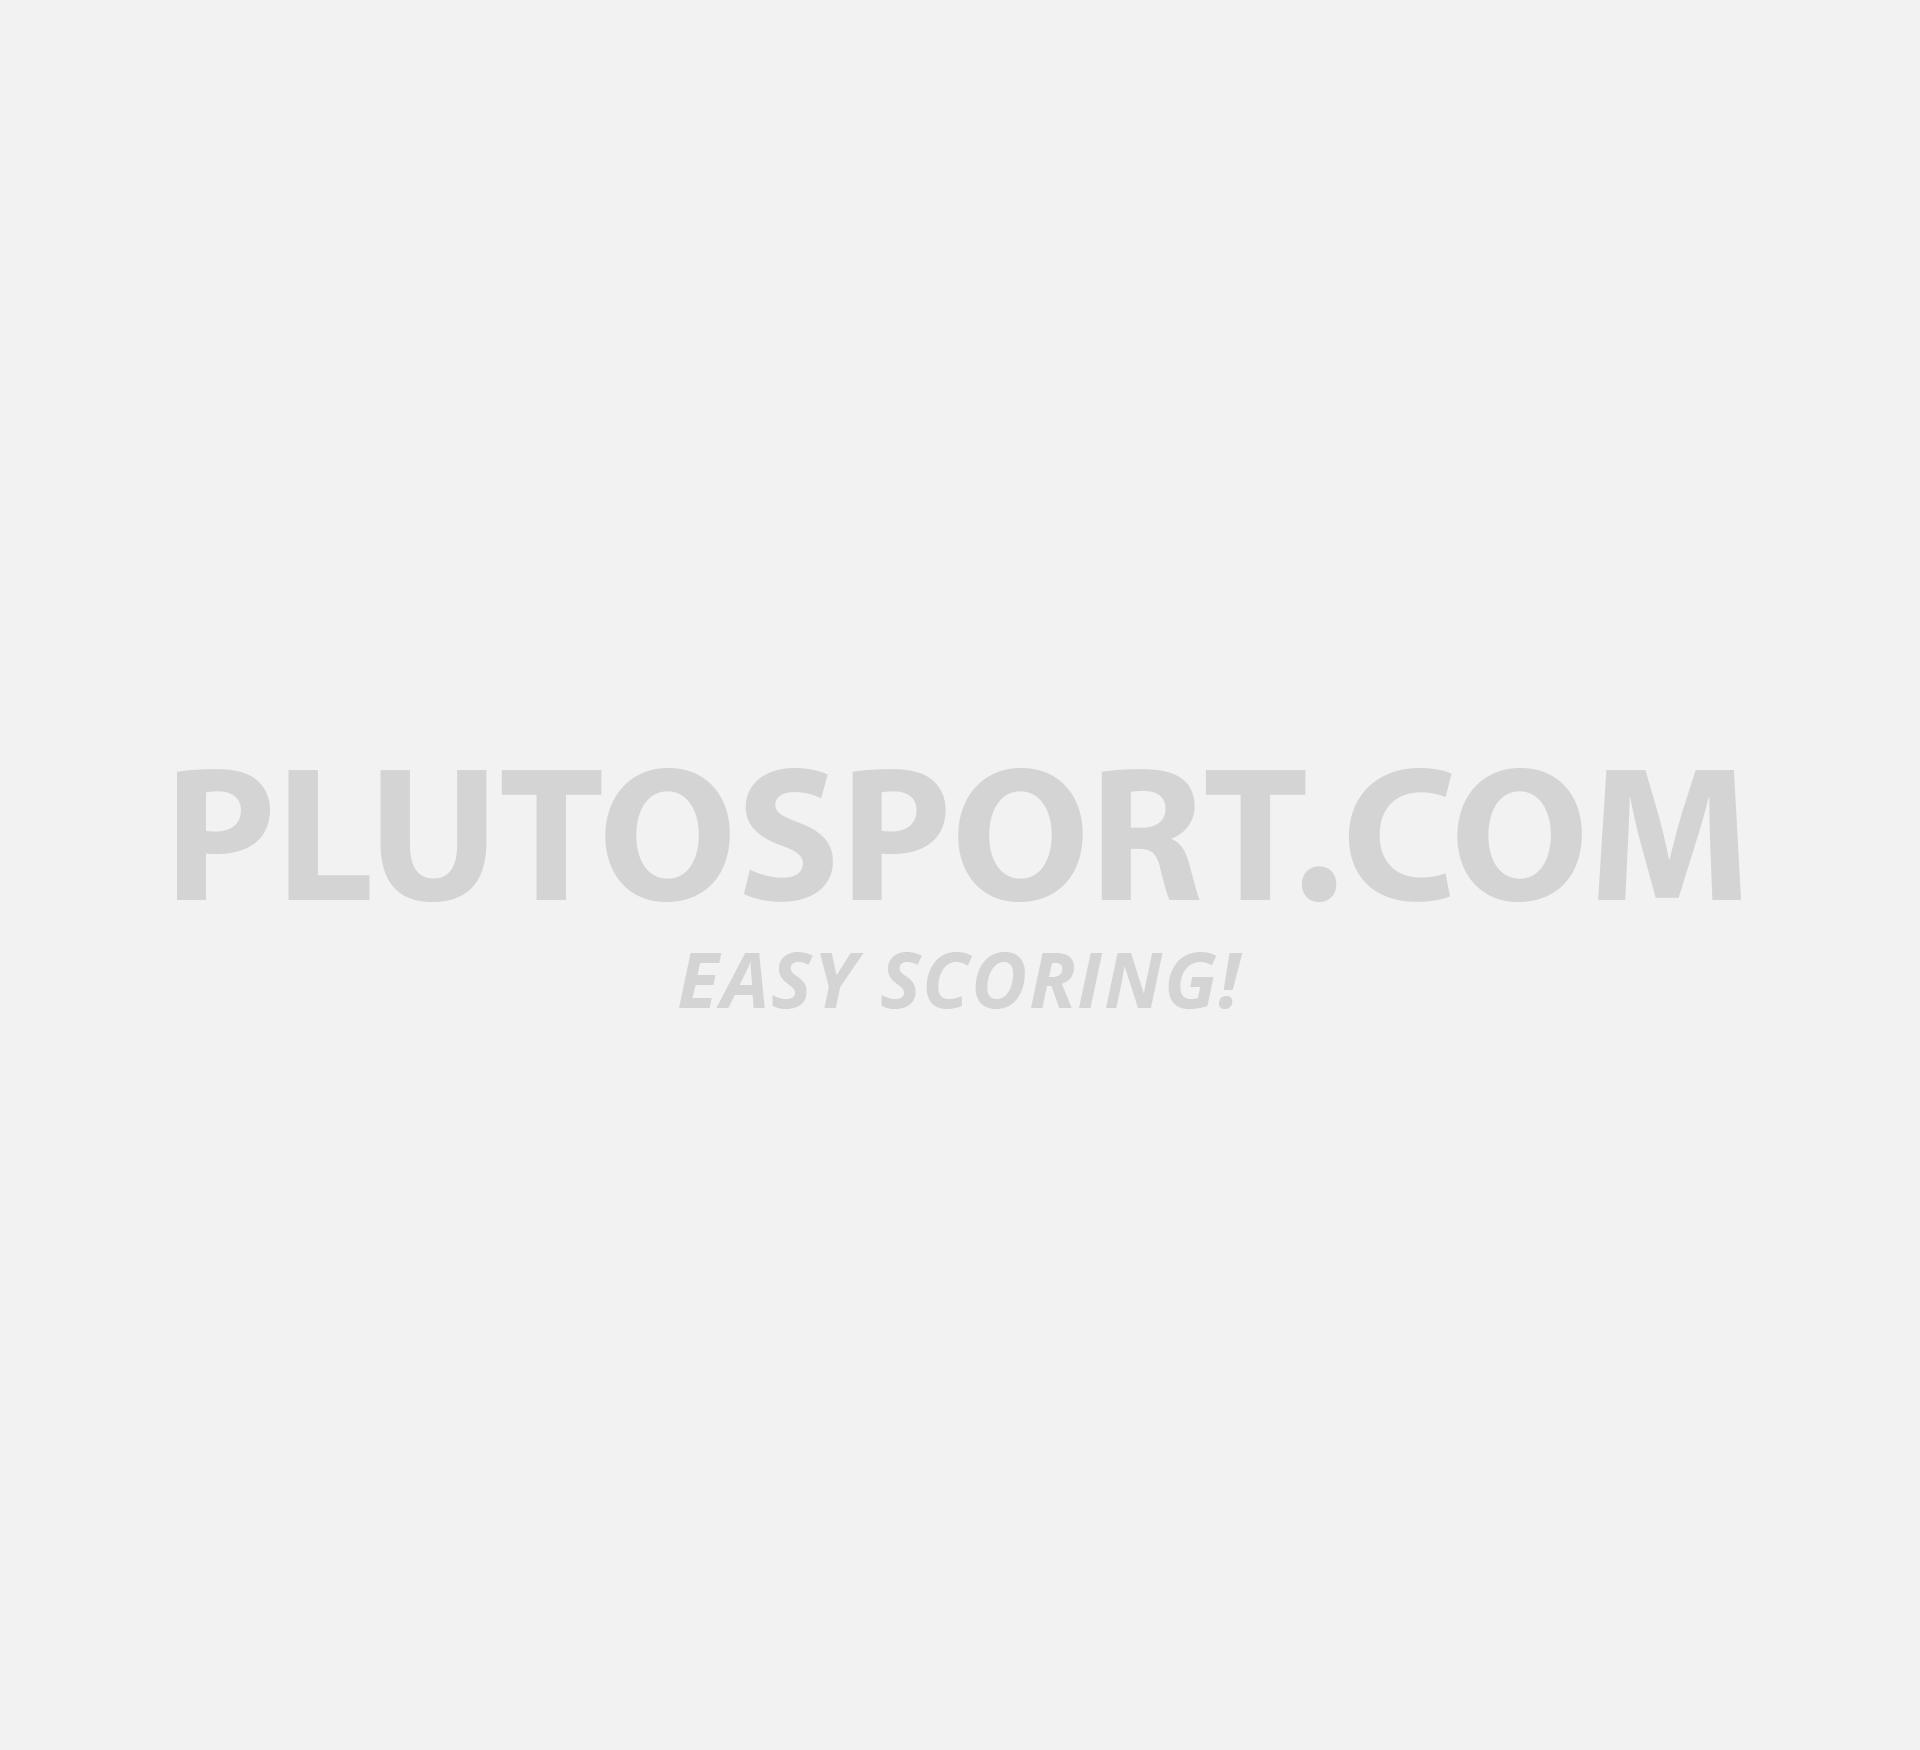 Adidas Pweb Elbow Sleeve